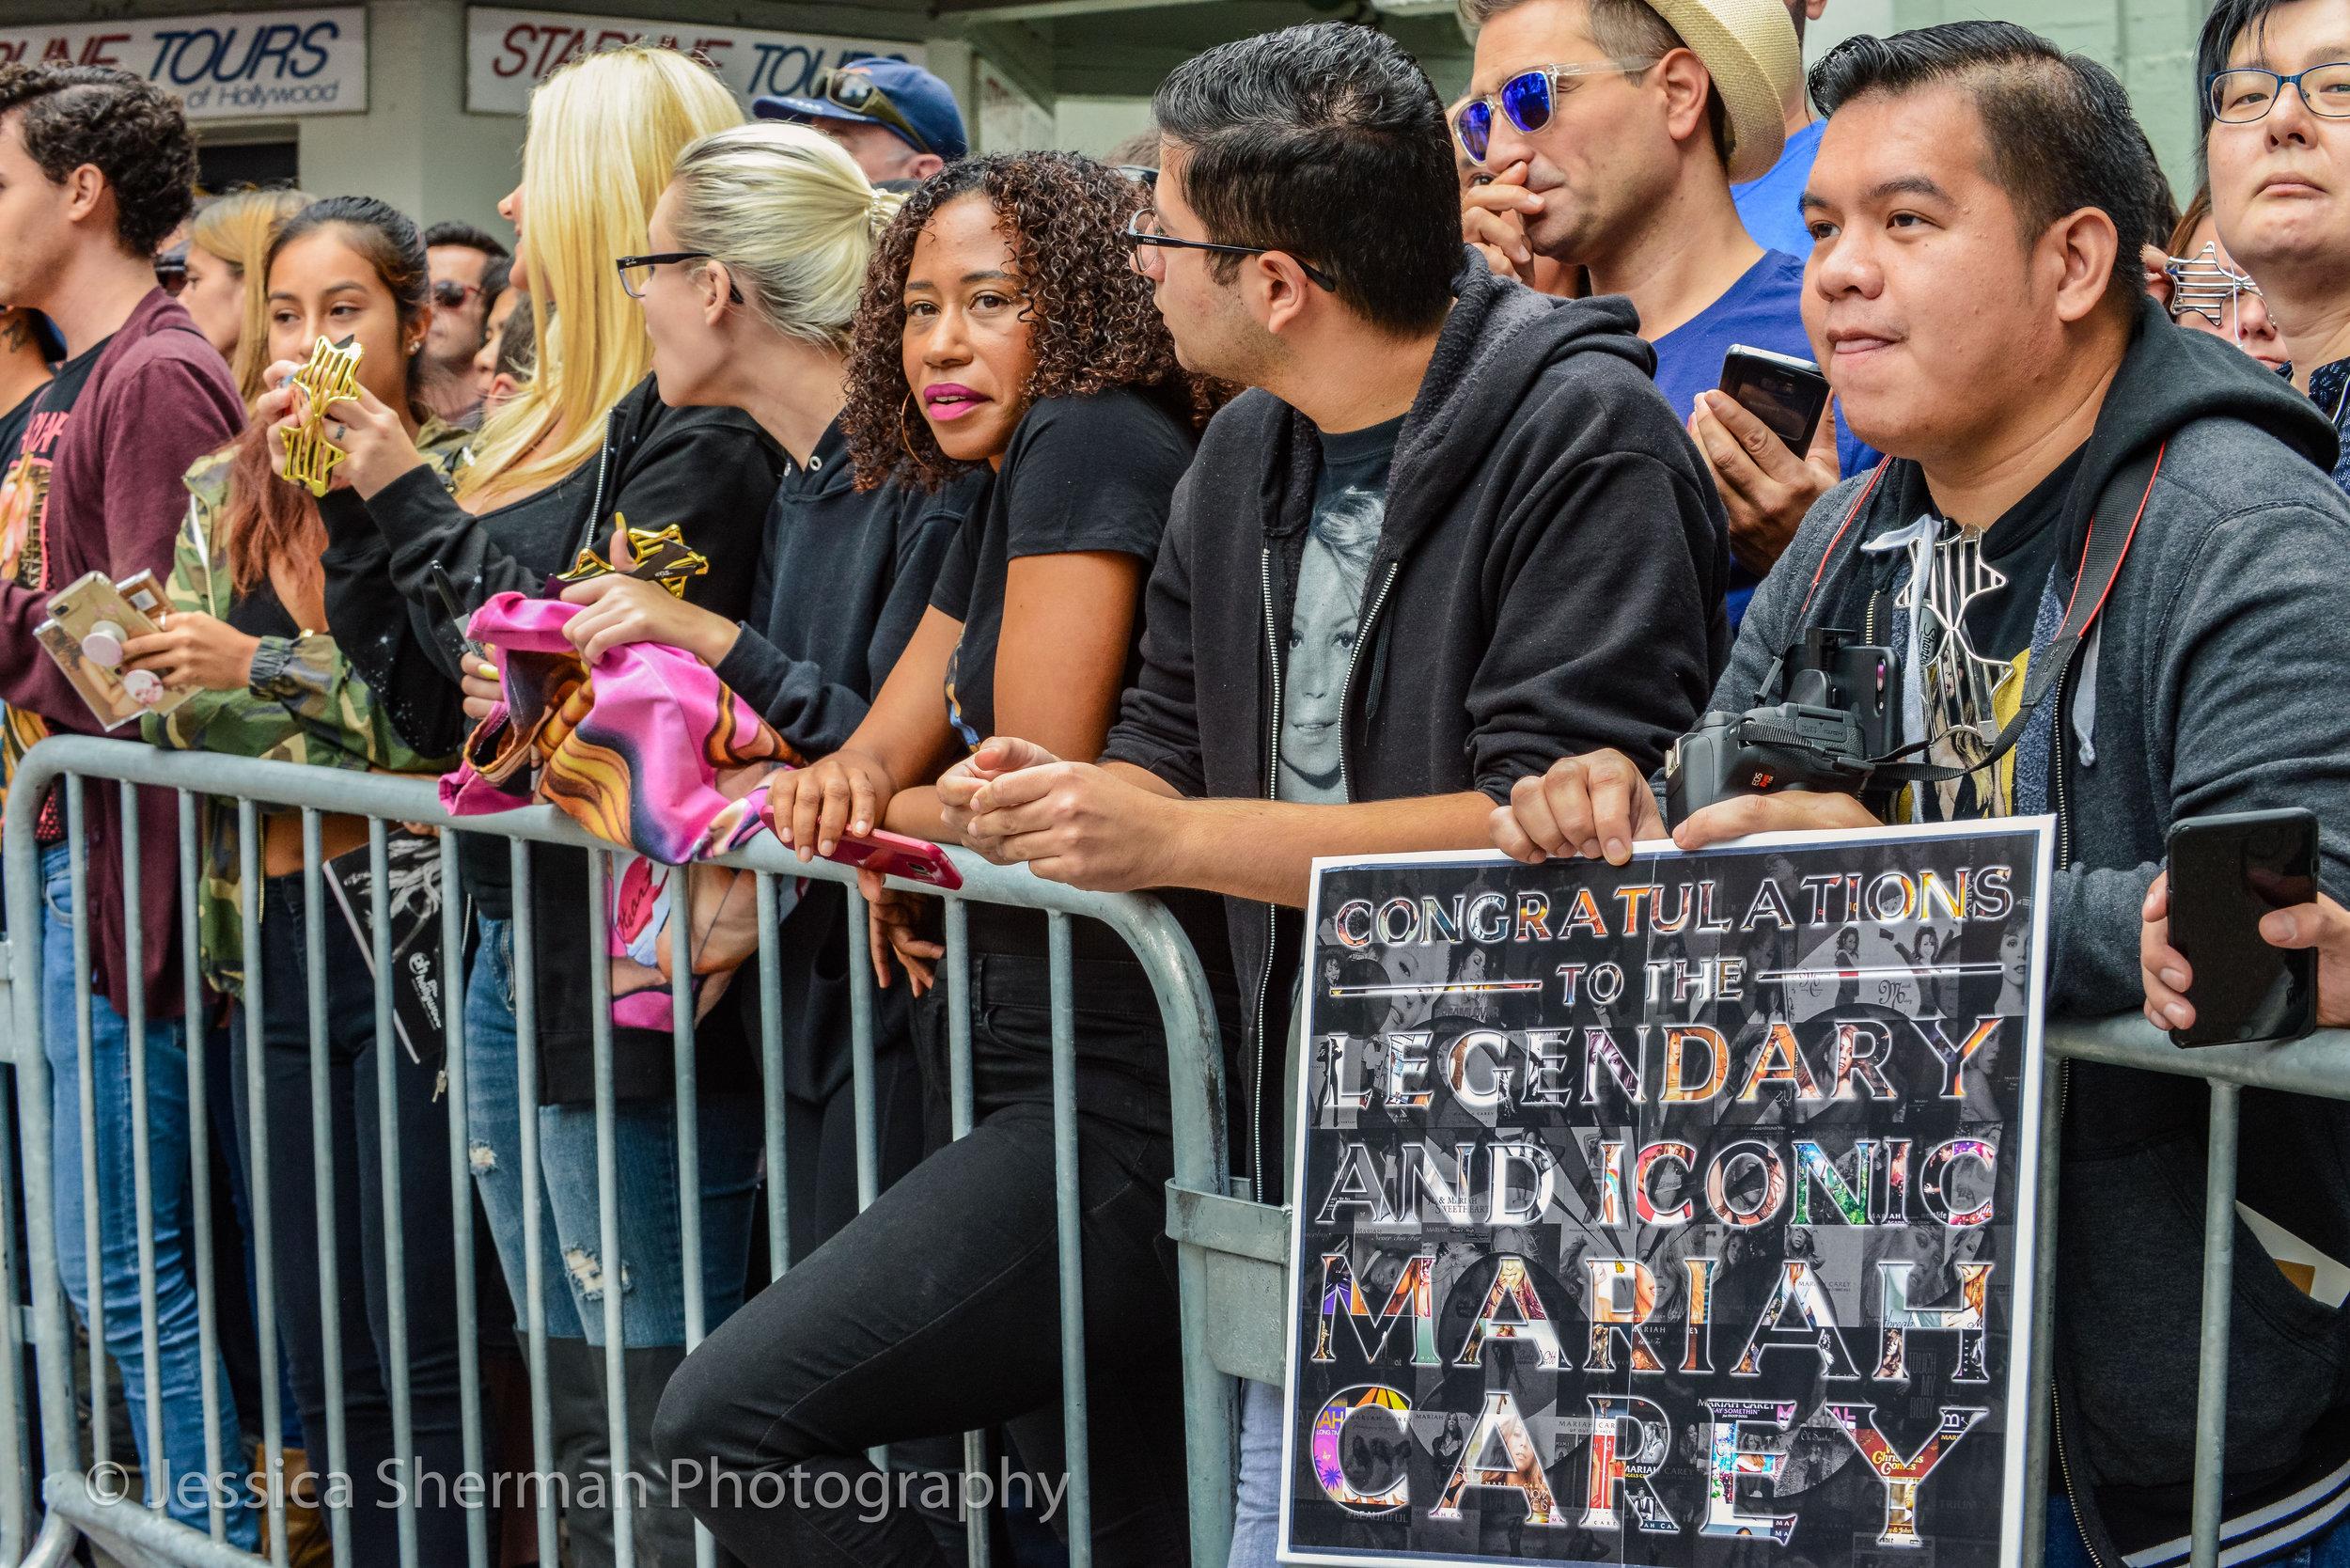 Mariah-Carey-Jessica-Sherman-Fans.jpg